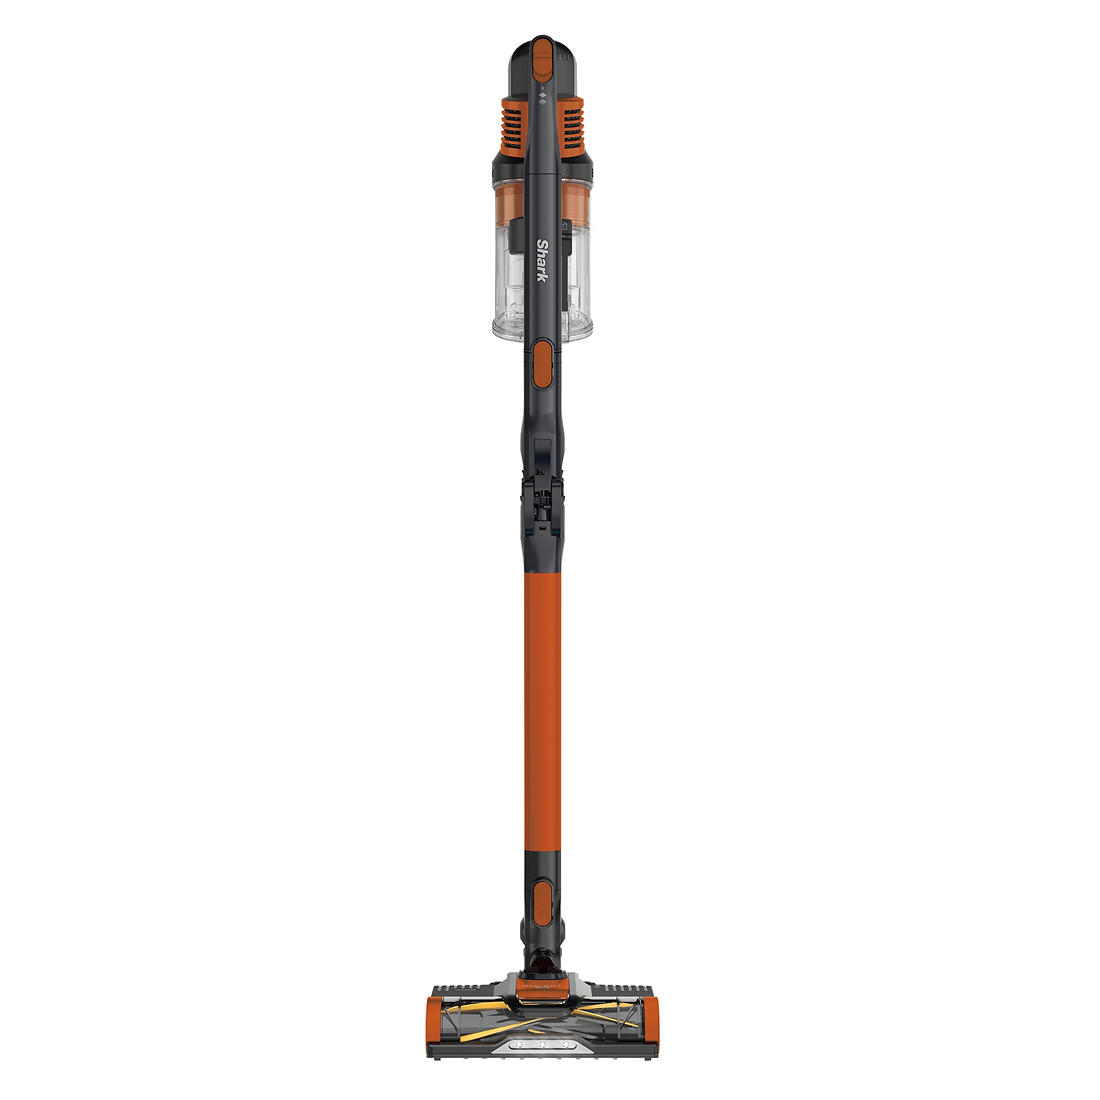 Shark Rocket Pro Cordless Stick Vacuum - BJs WholeSale Club